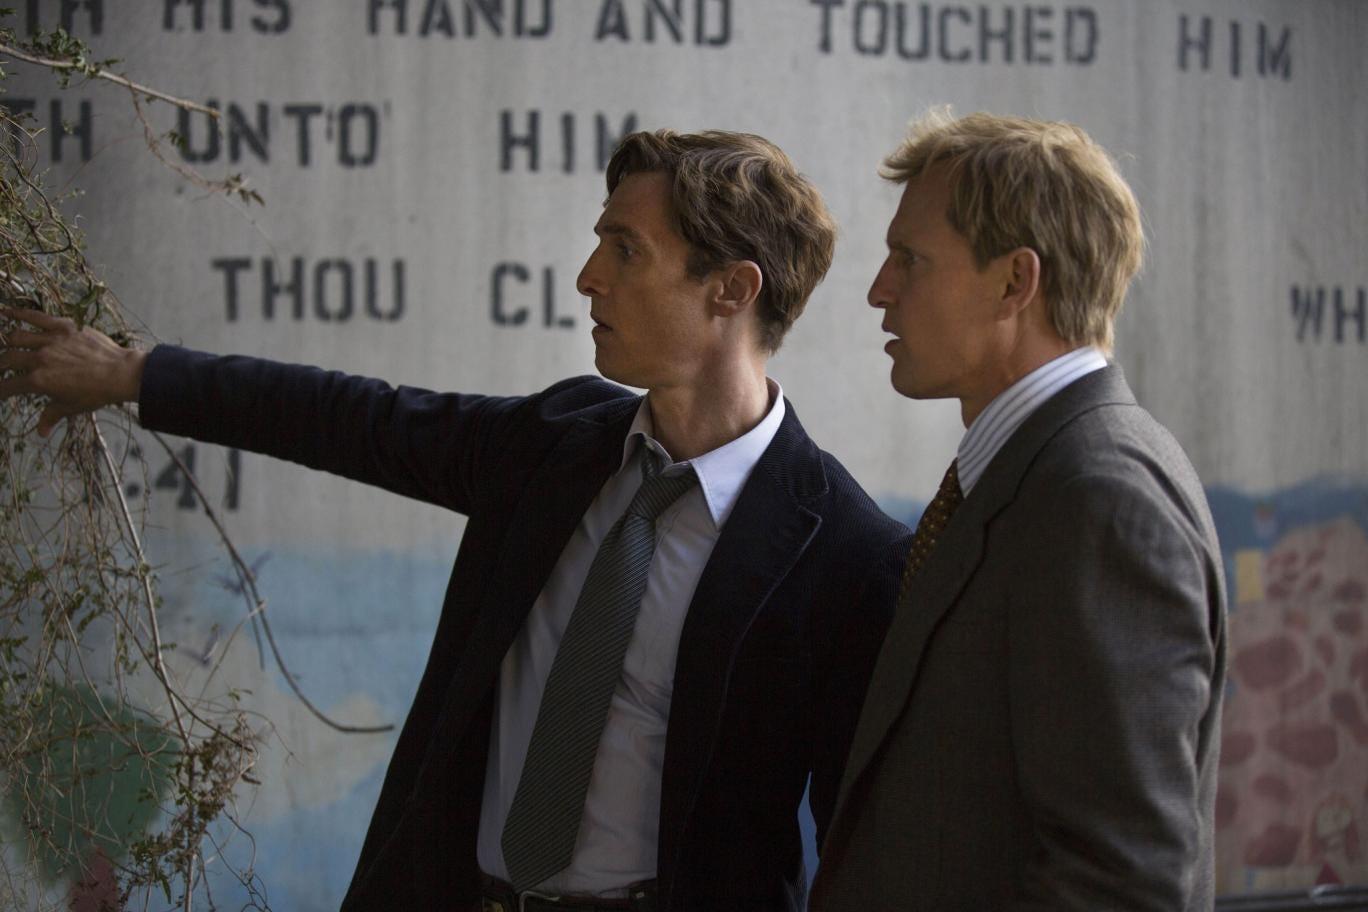 Matthew McConaughey and Woody Harrelson star as Louisiana detectives